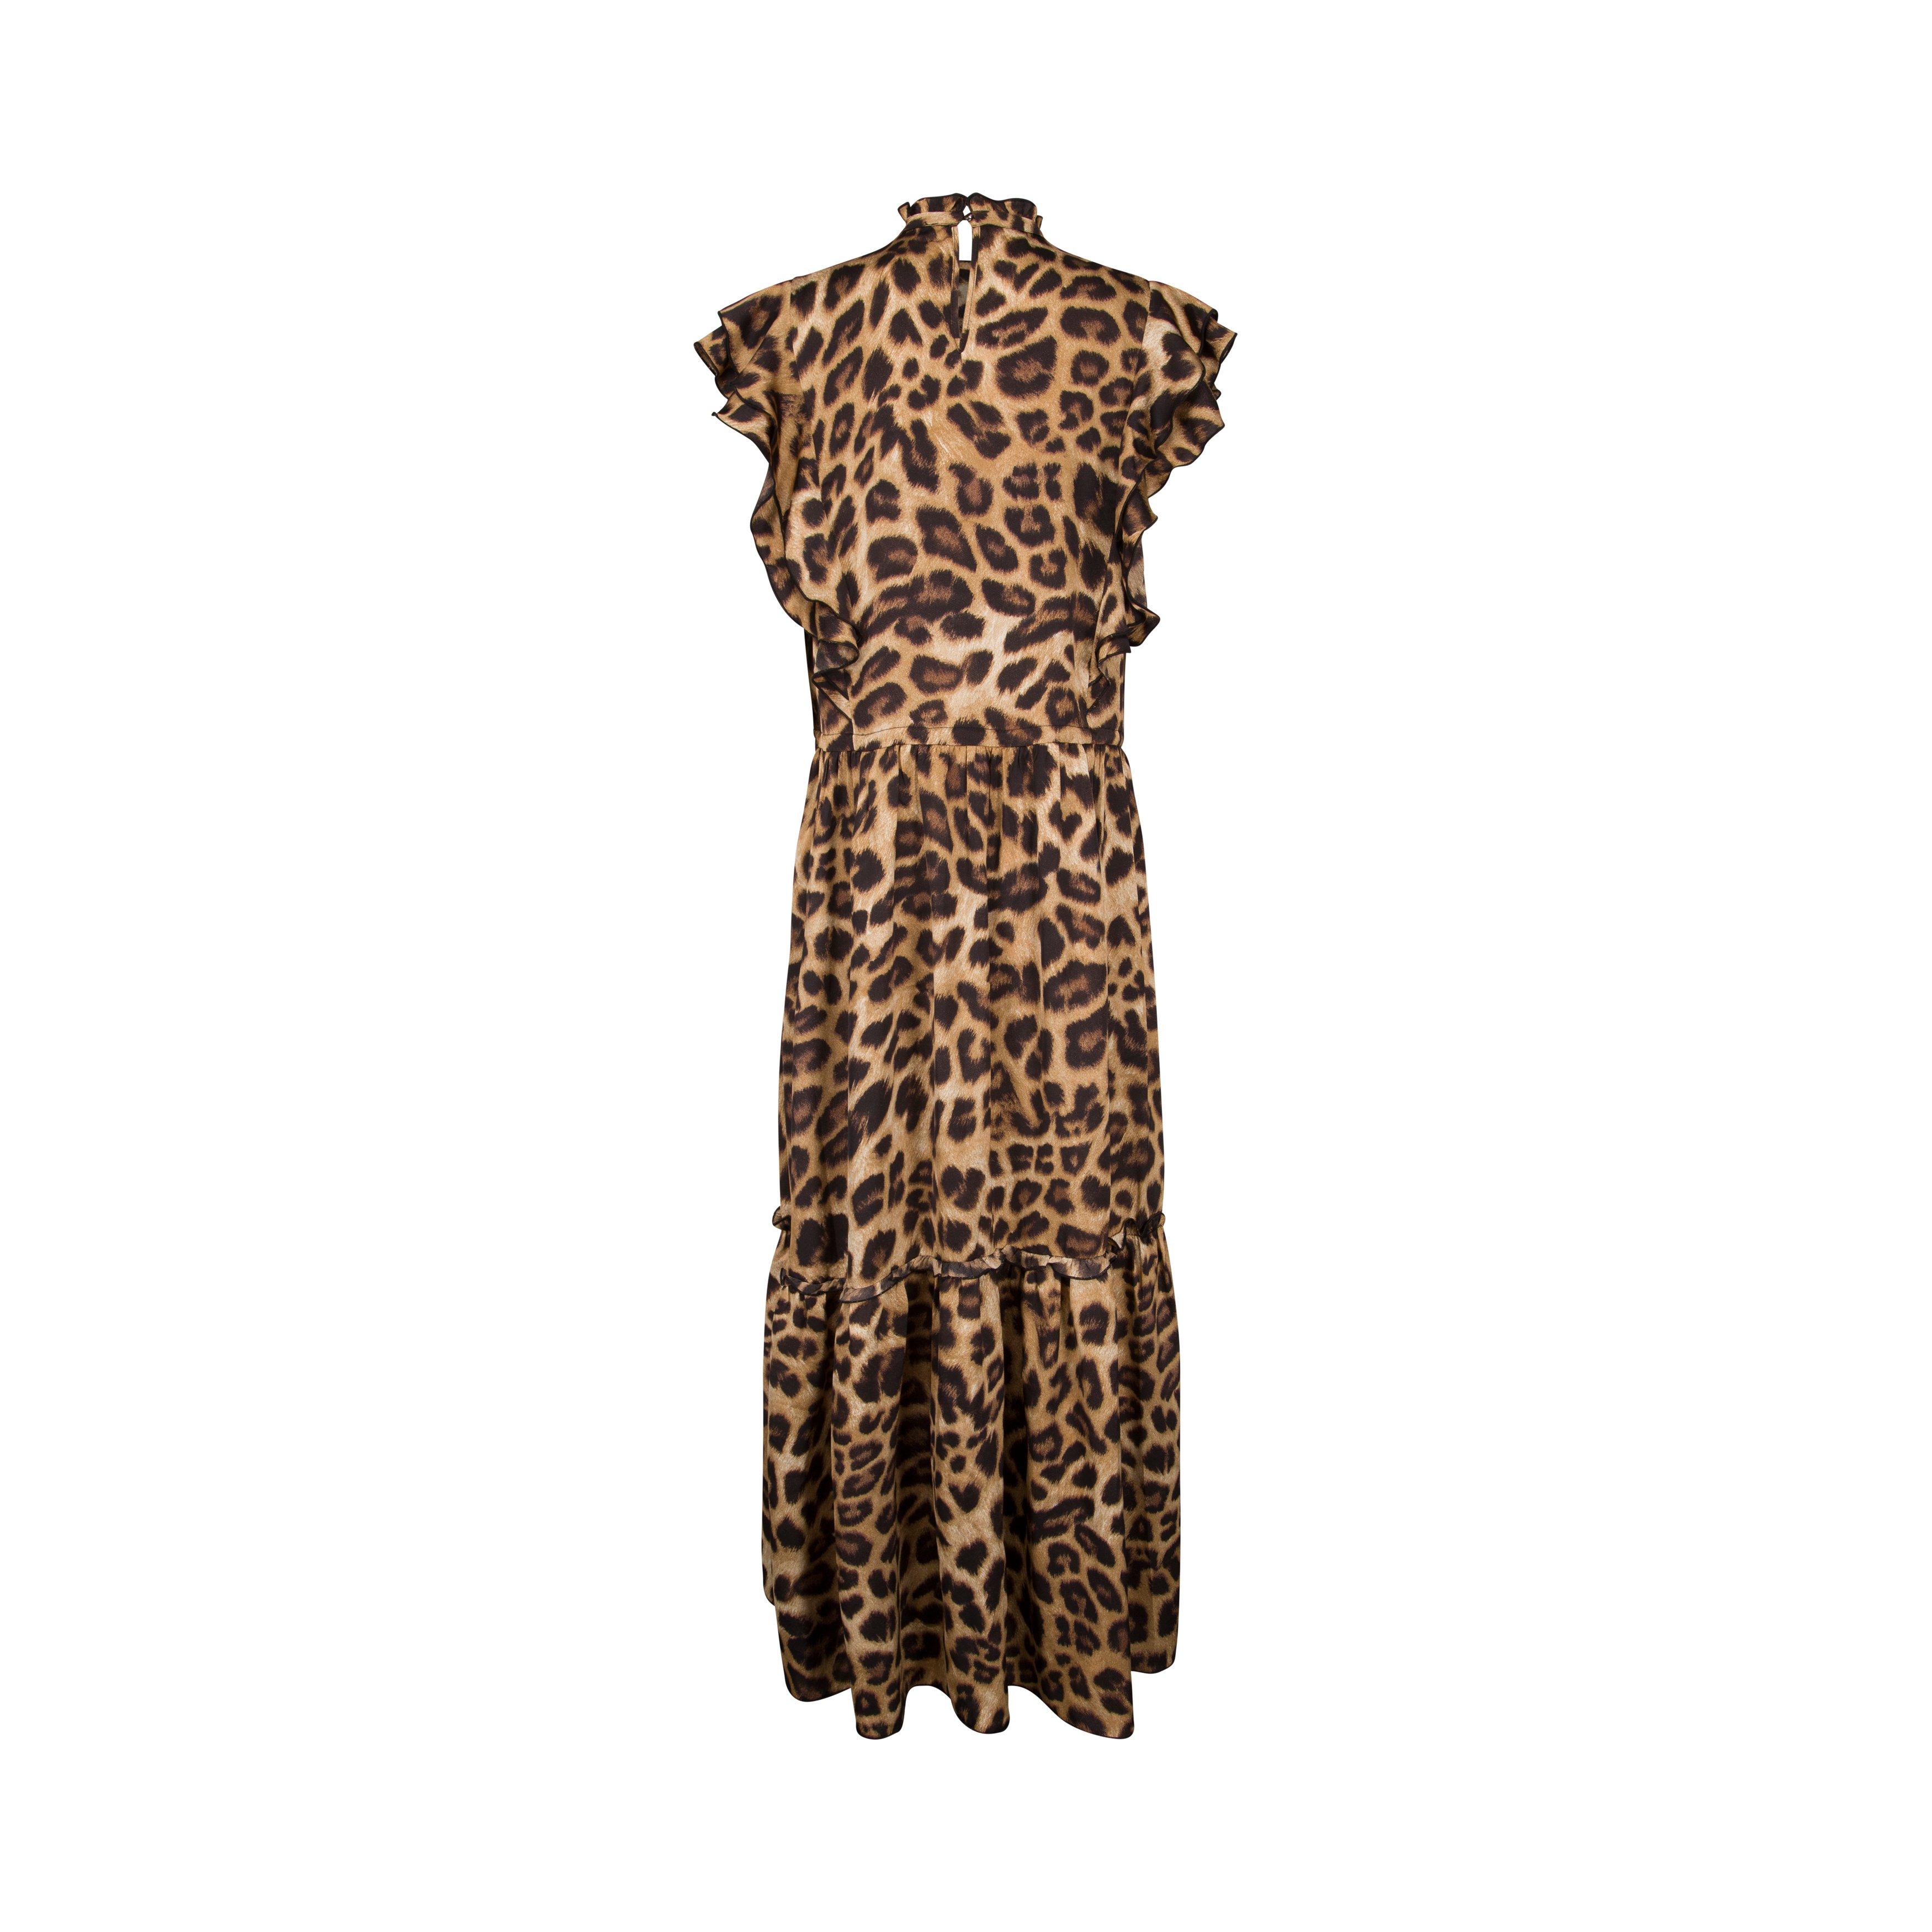 Sofie Schnoor Leopard maxiklänning